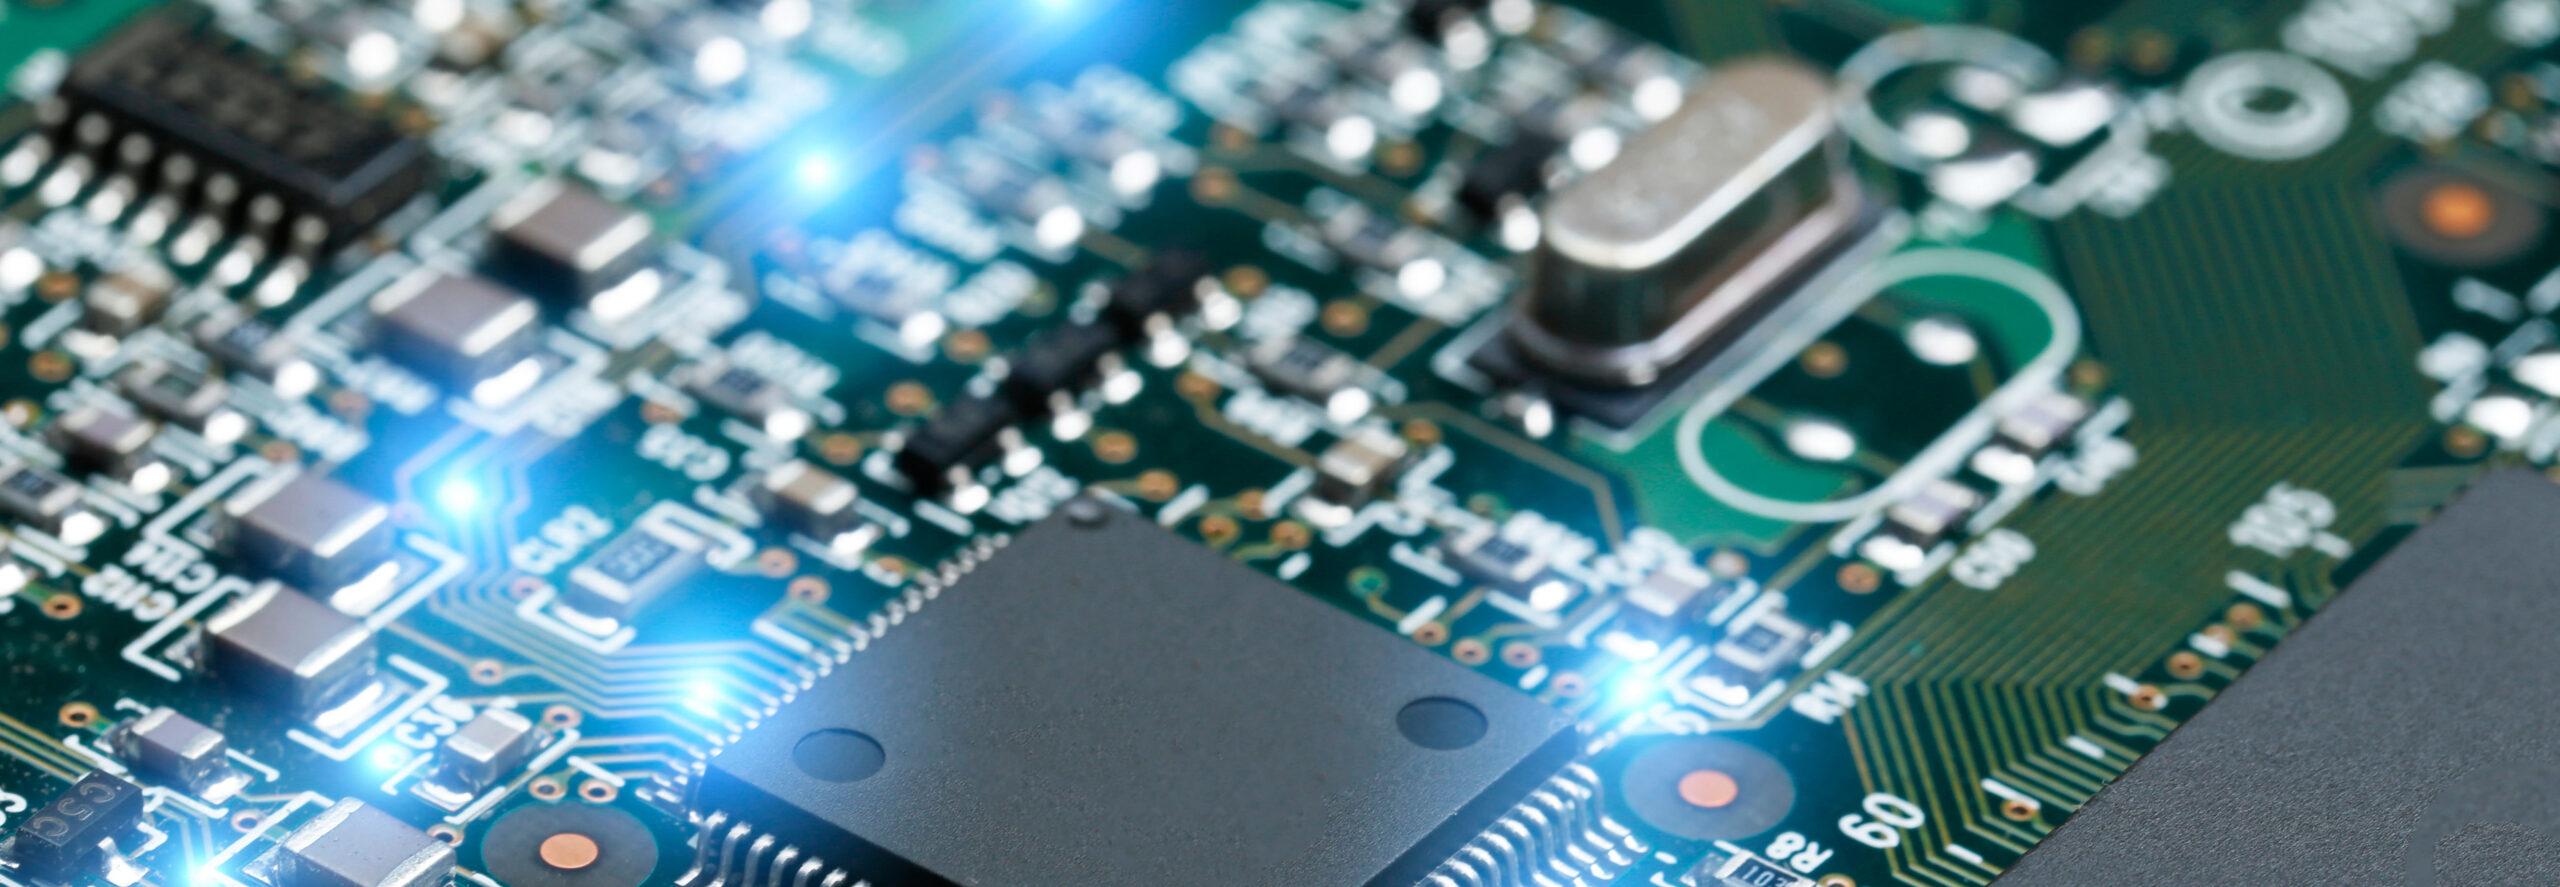 Microchip slider principal deamatic